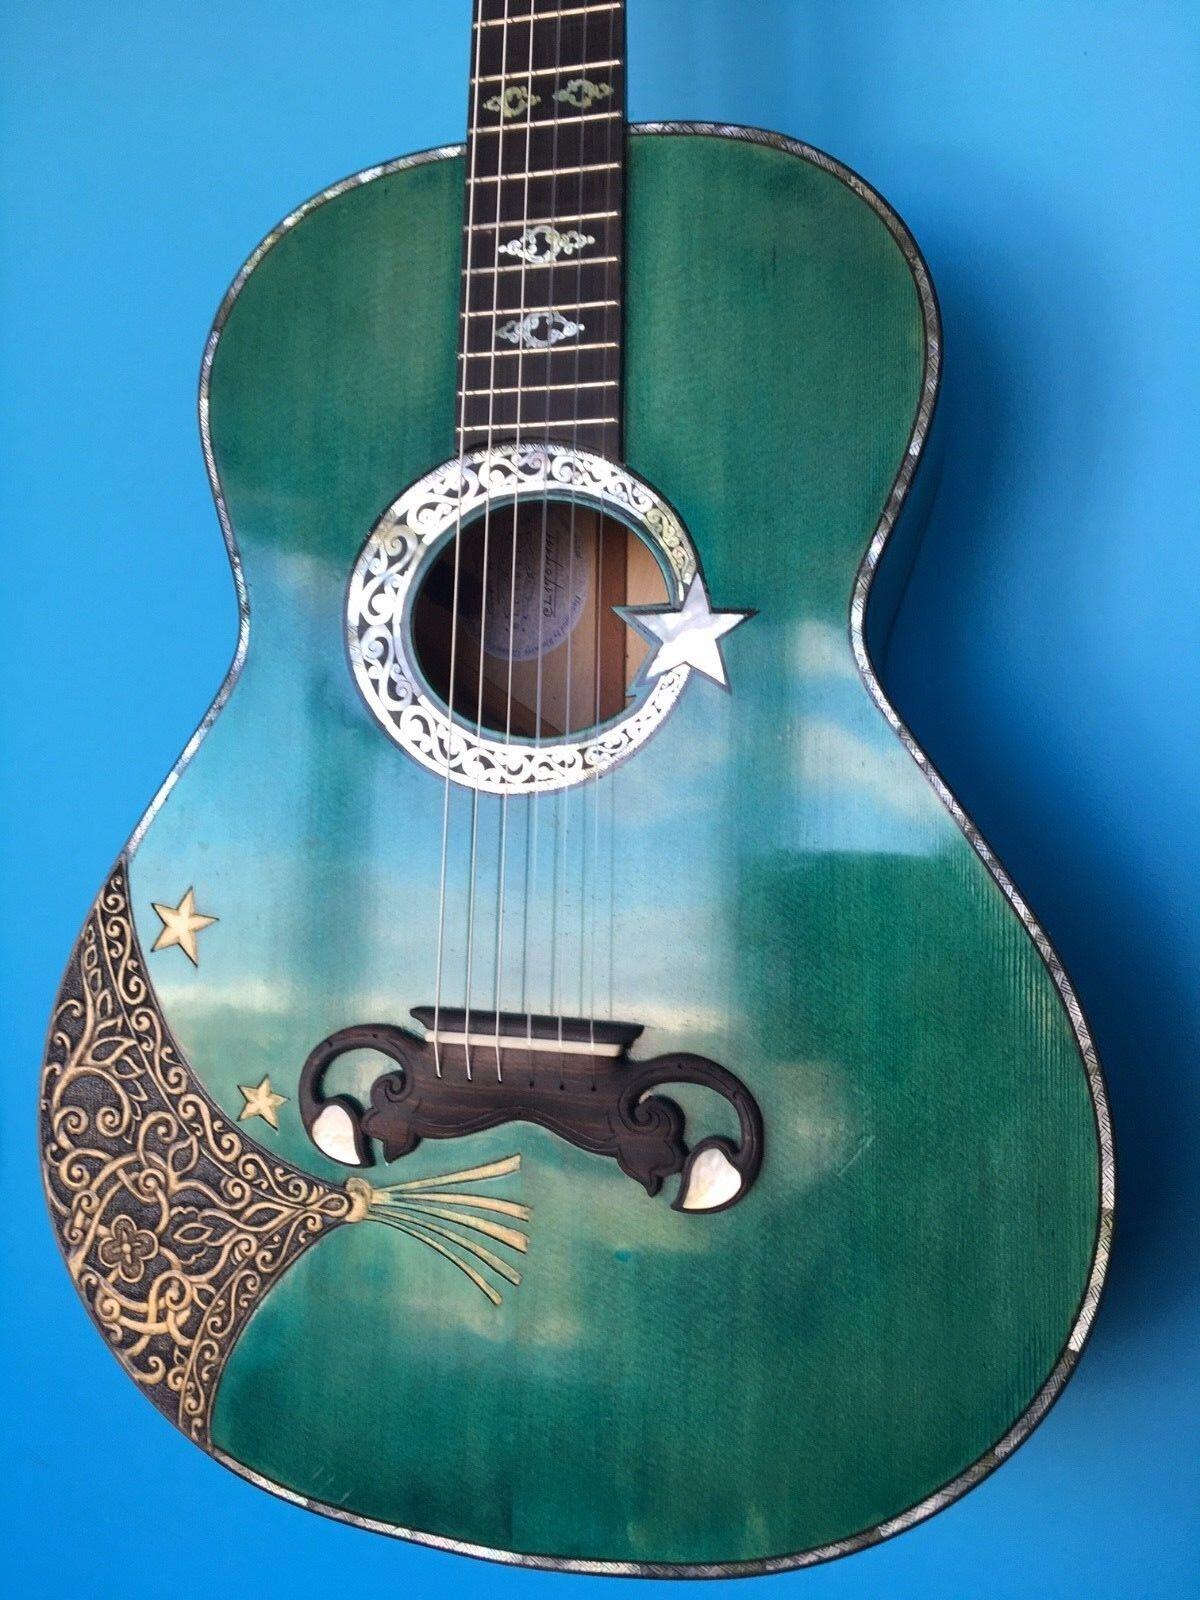 Blauberry Special Order Handmade Classical Guitar